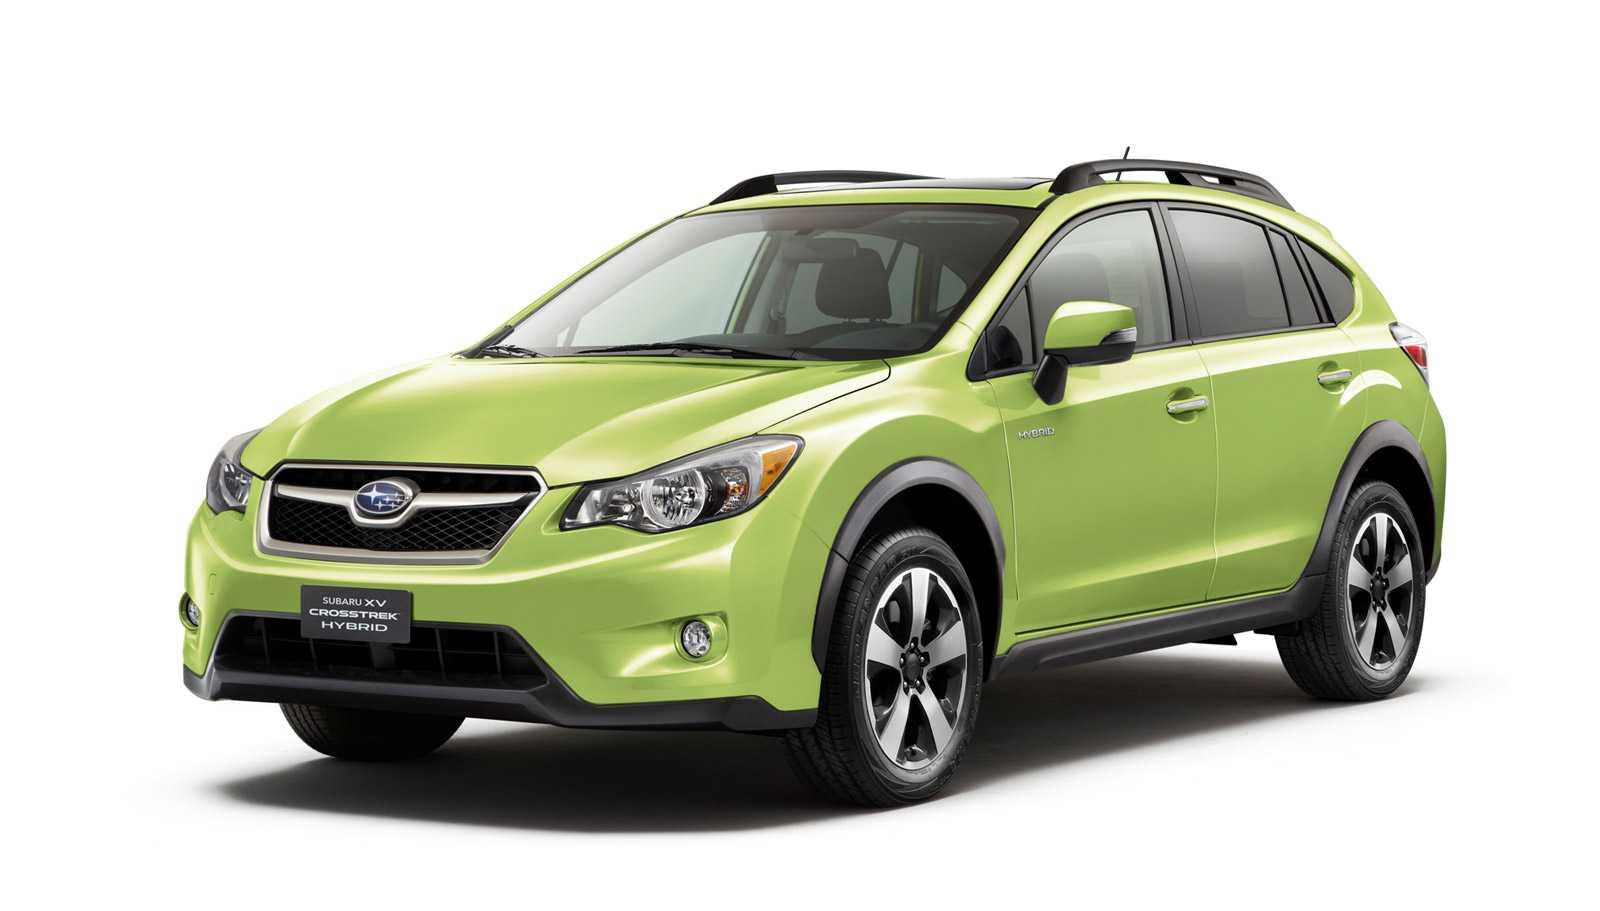 Subaru Crosstrek Hybrid Discontinued, Company Details Future Plans